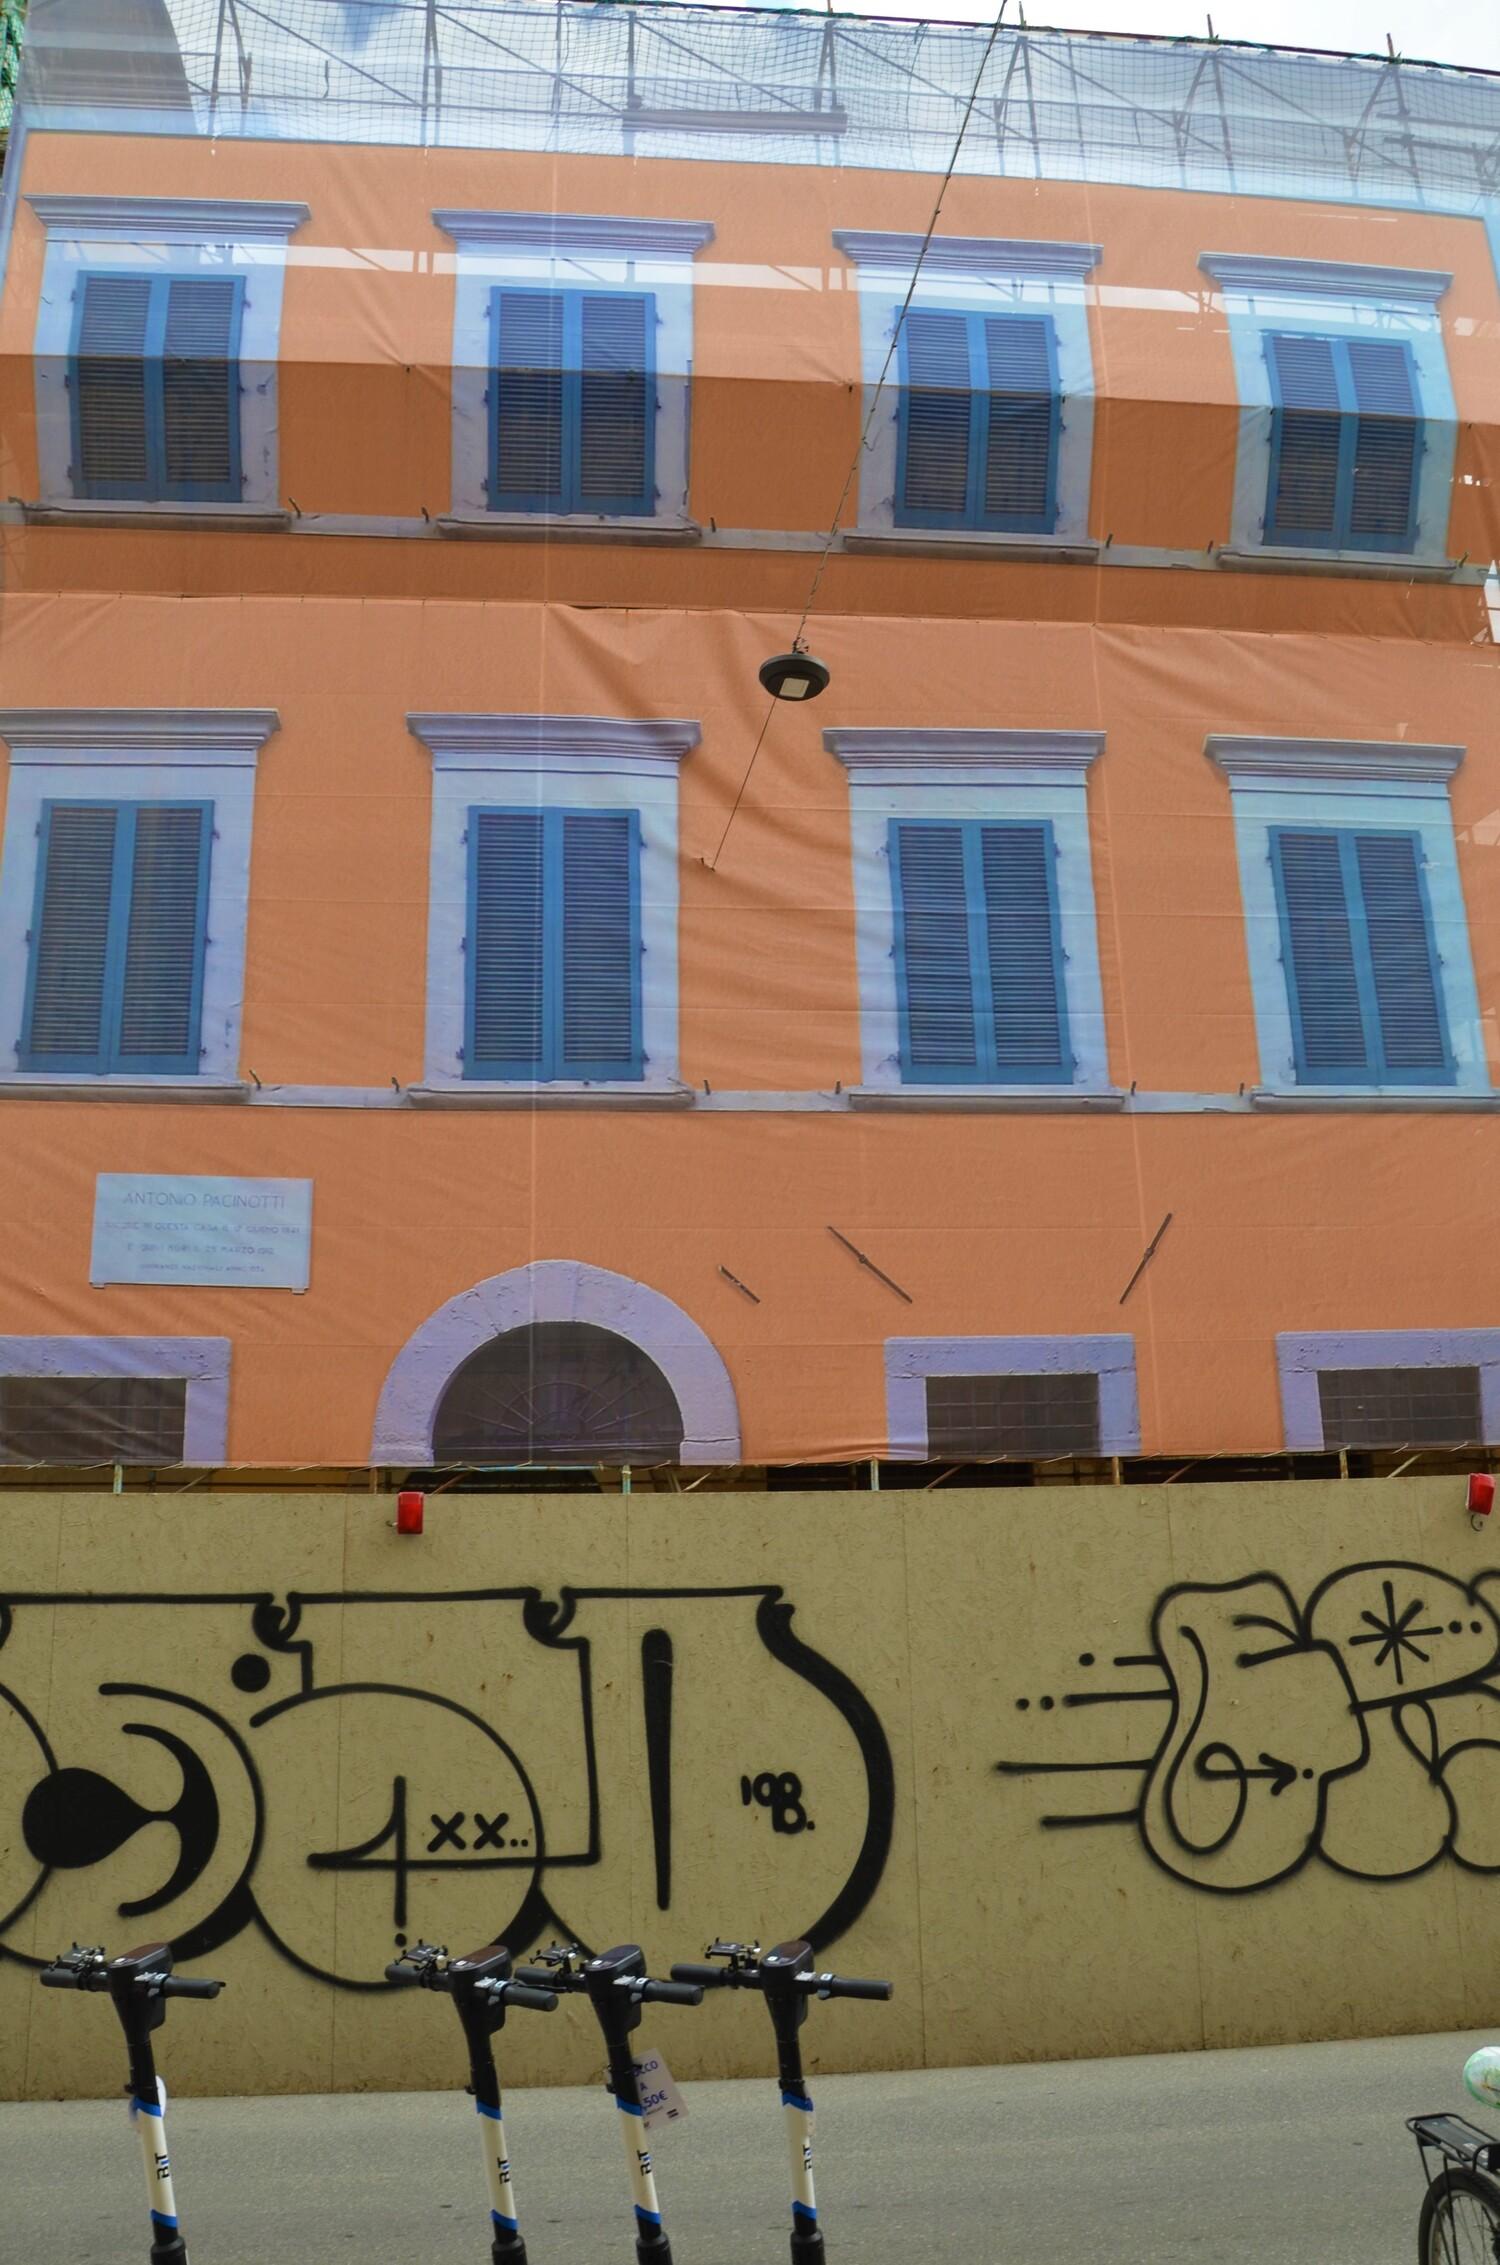 Casa natale A. Pacinotti (L. Corevi, Comune di Pisa)